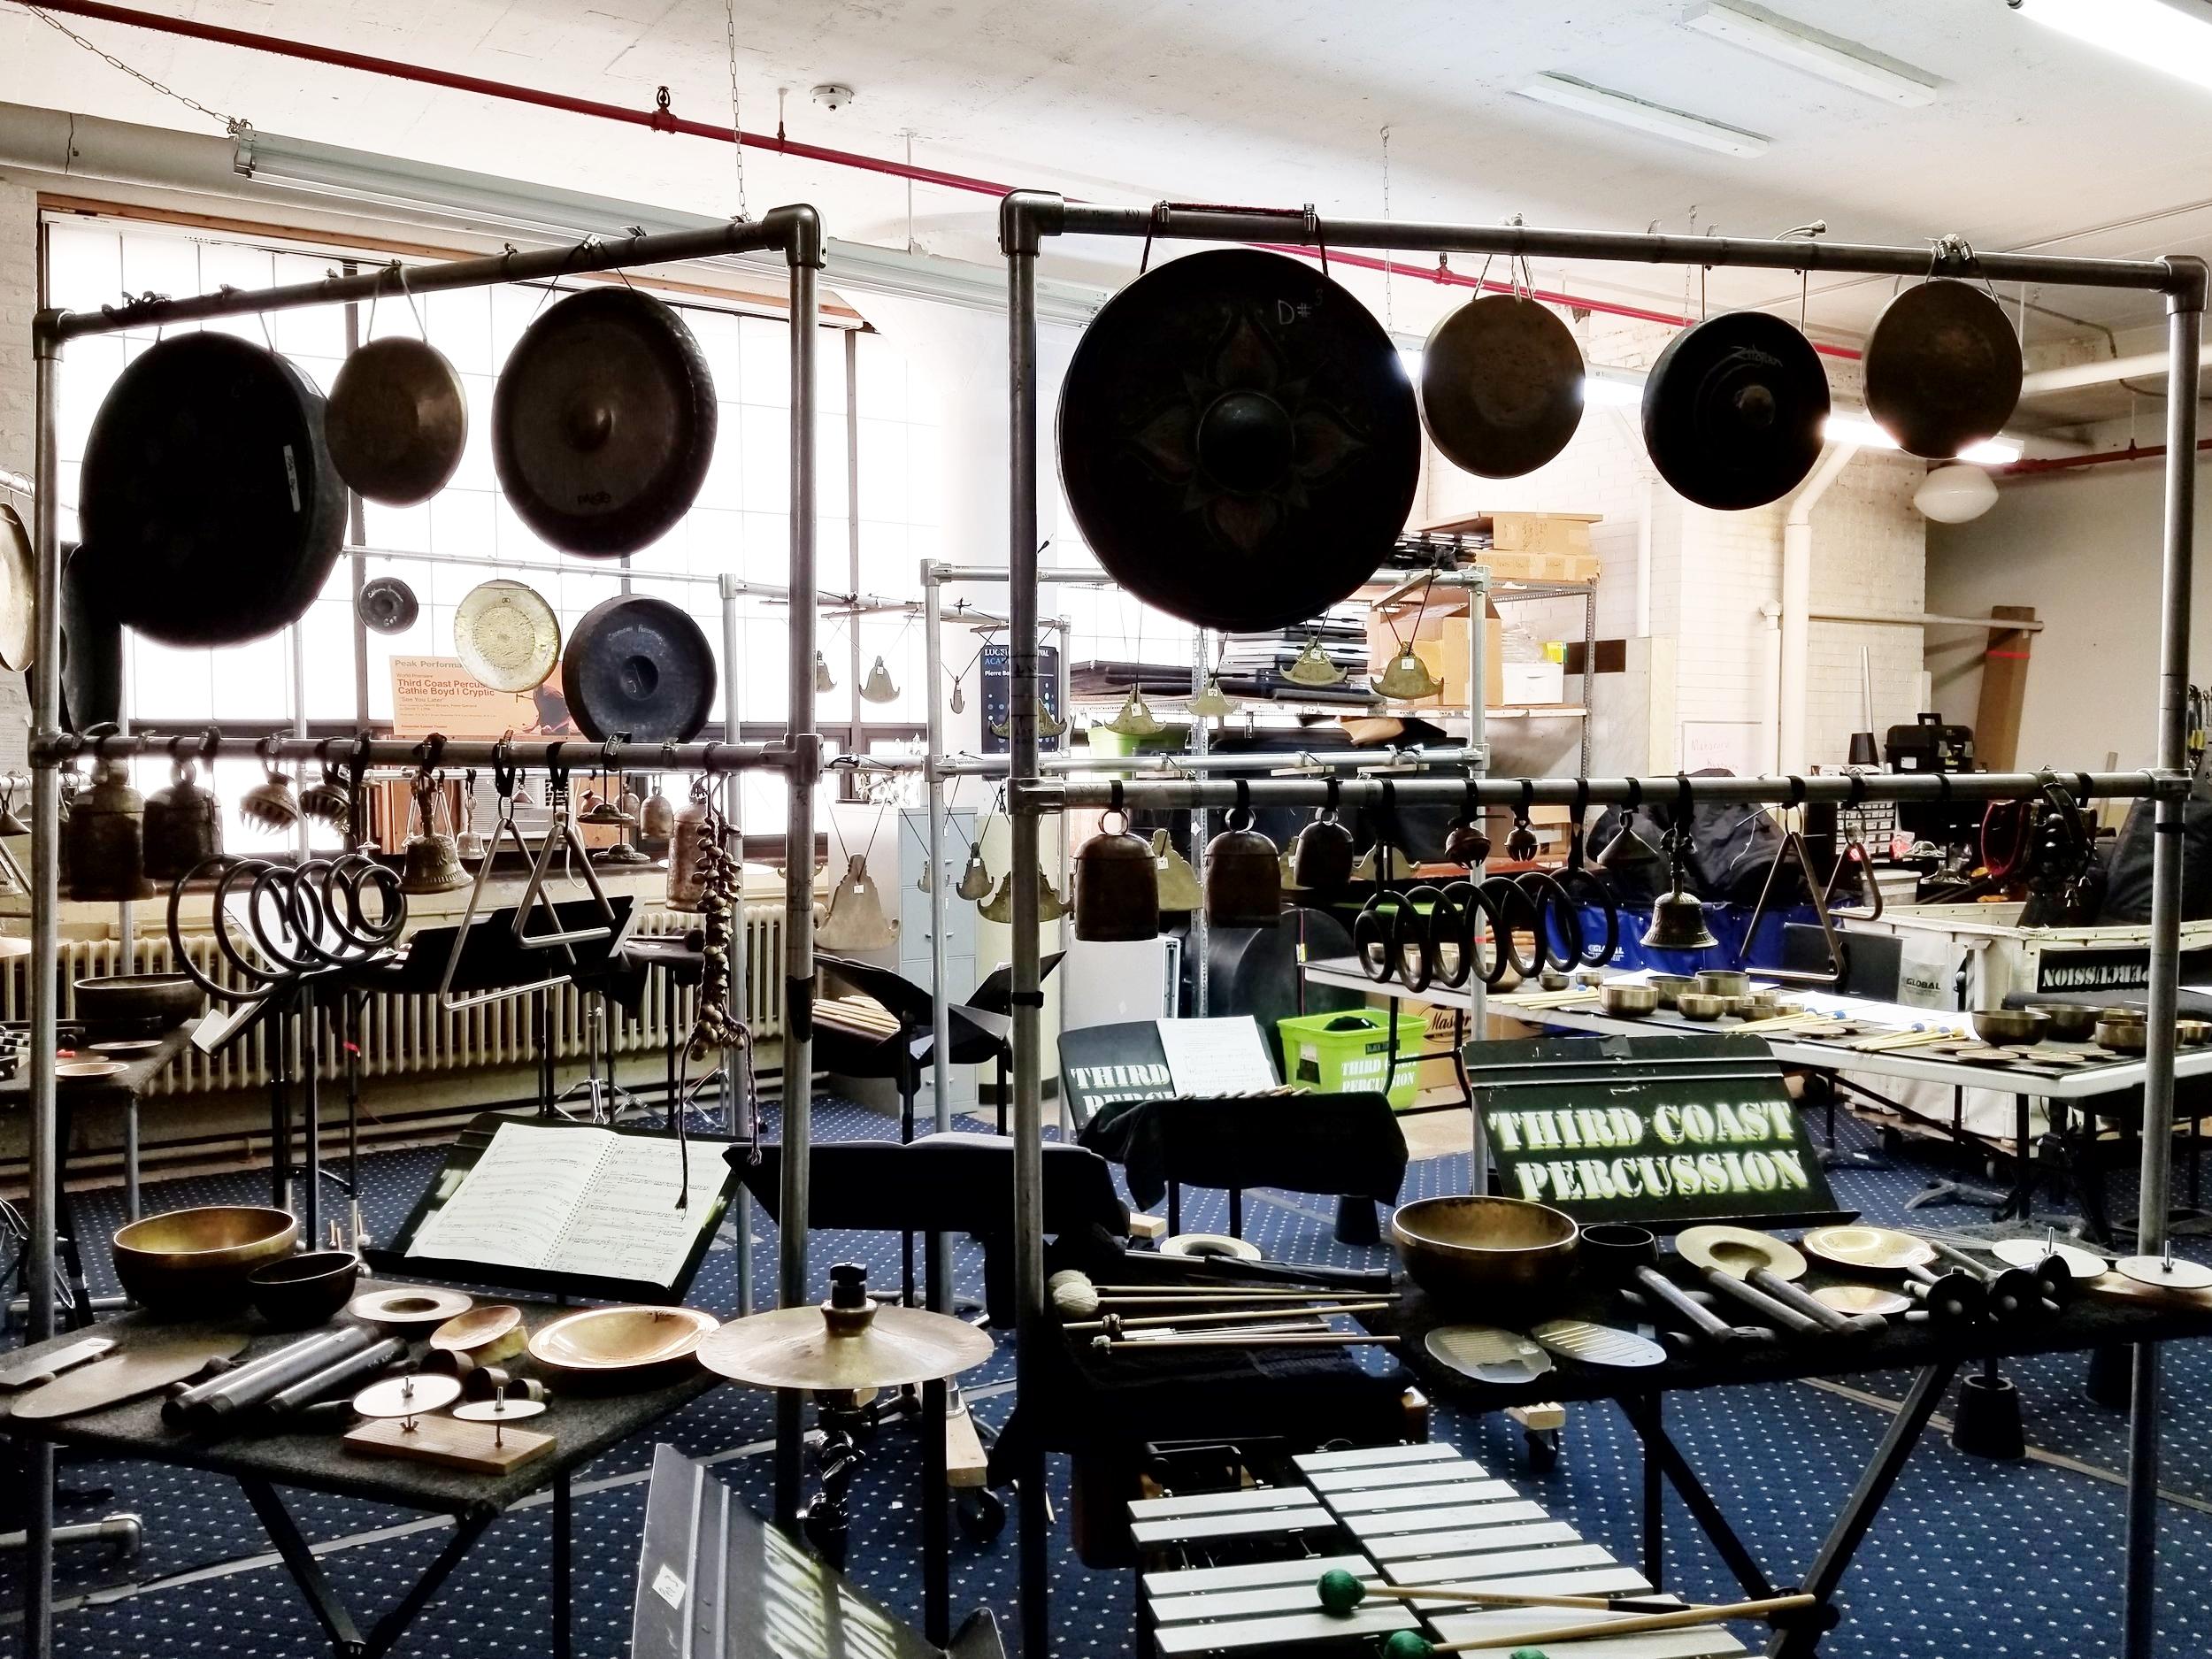 Inside Third Coast Percussion's studio